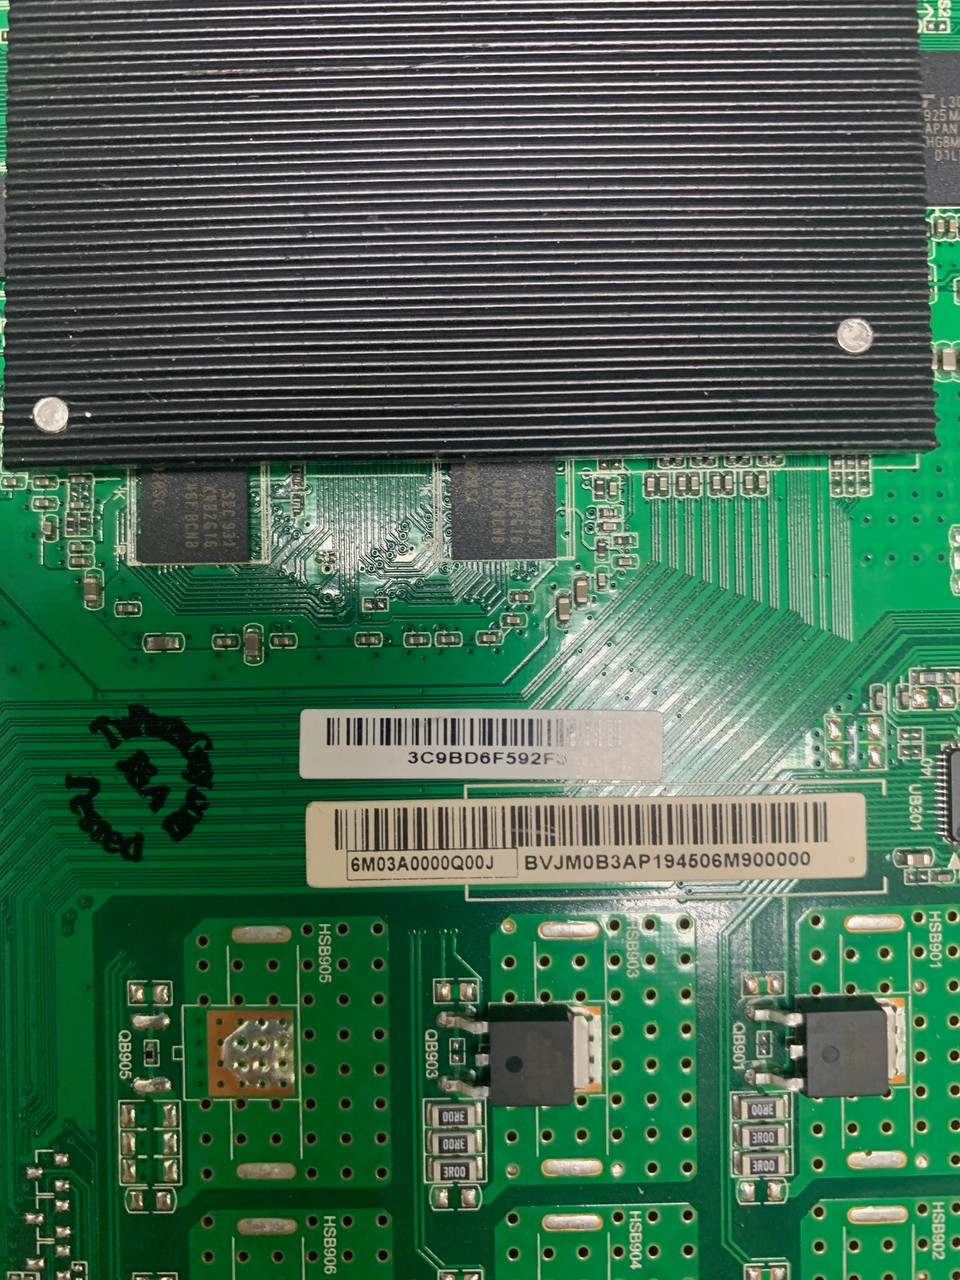 Vizio V405-G9 Main board TE.MT5597.EC762 / 6M03A0000Q00J